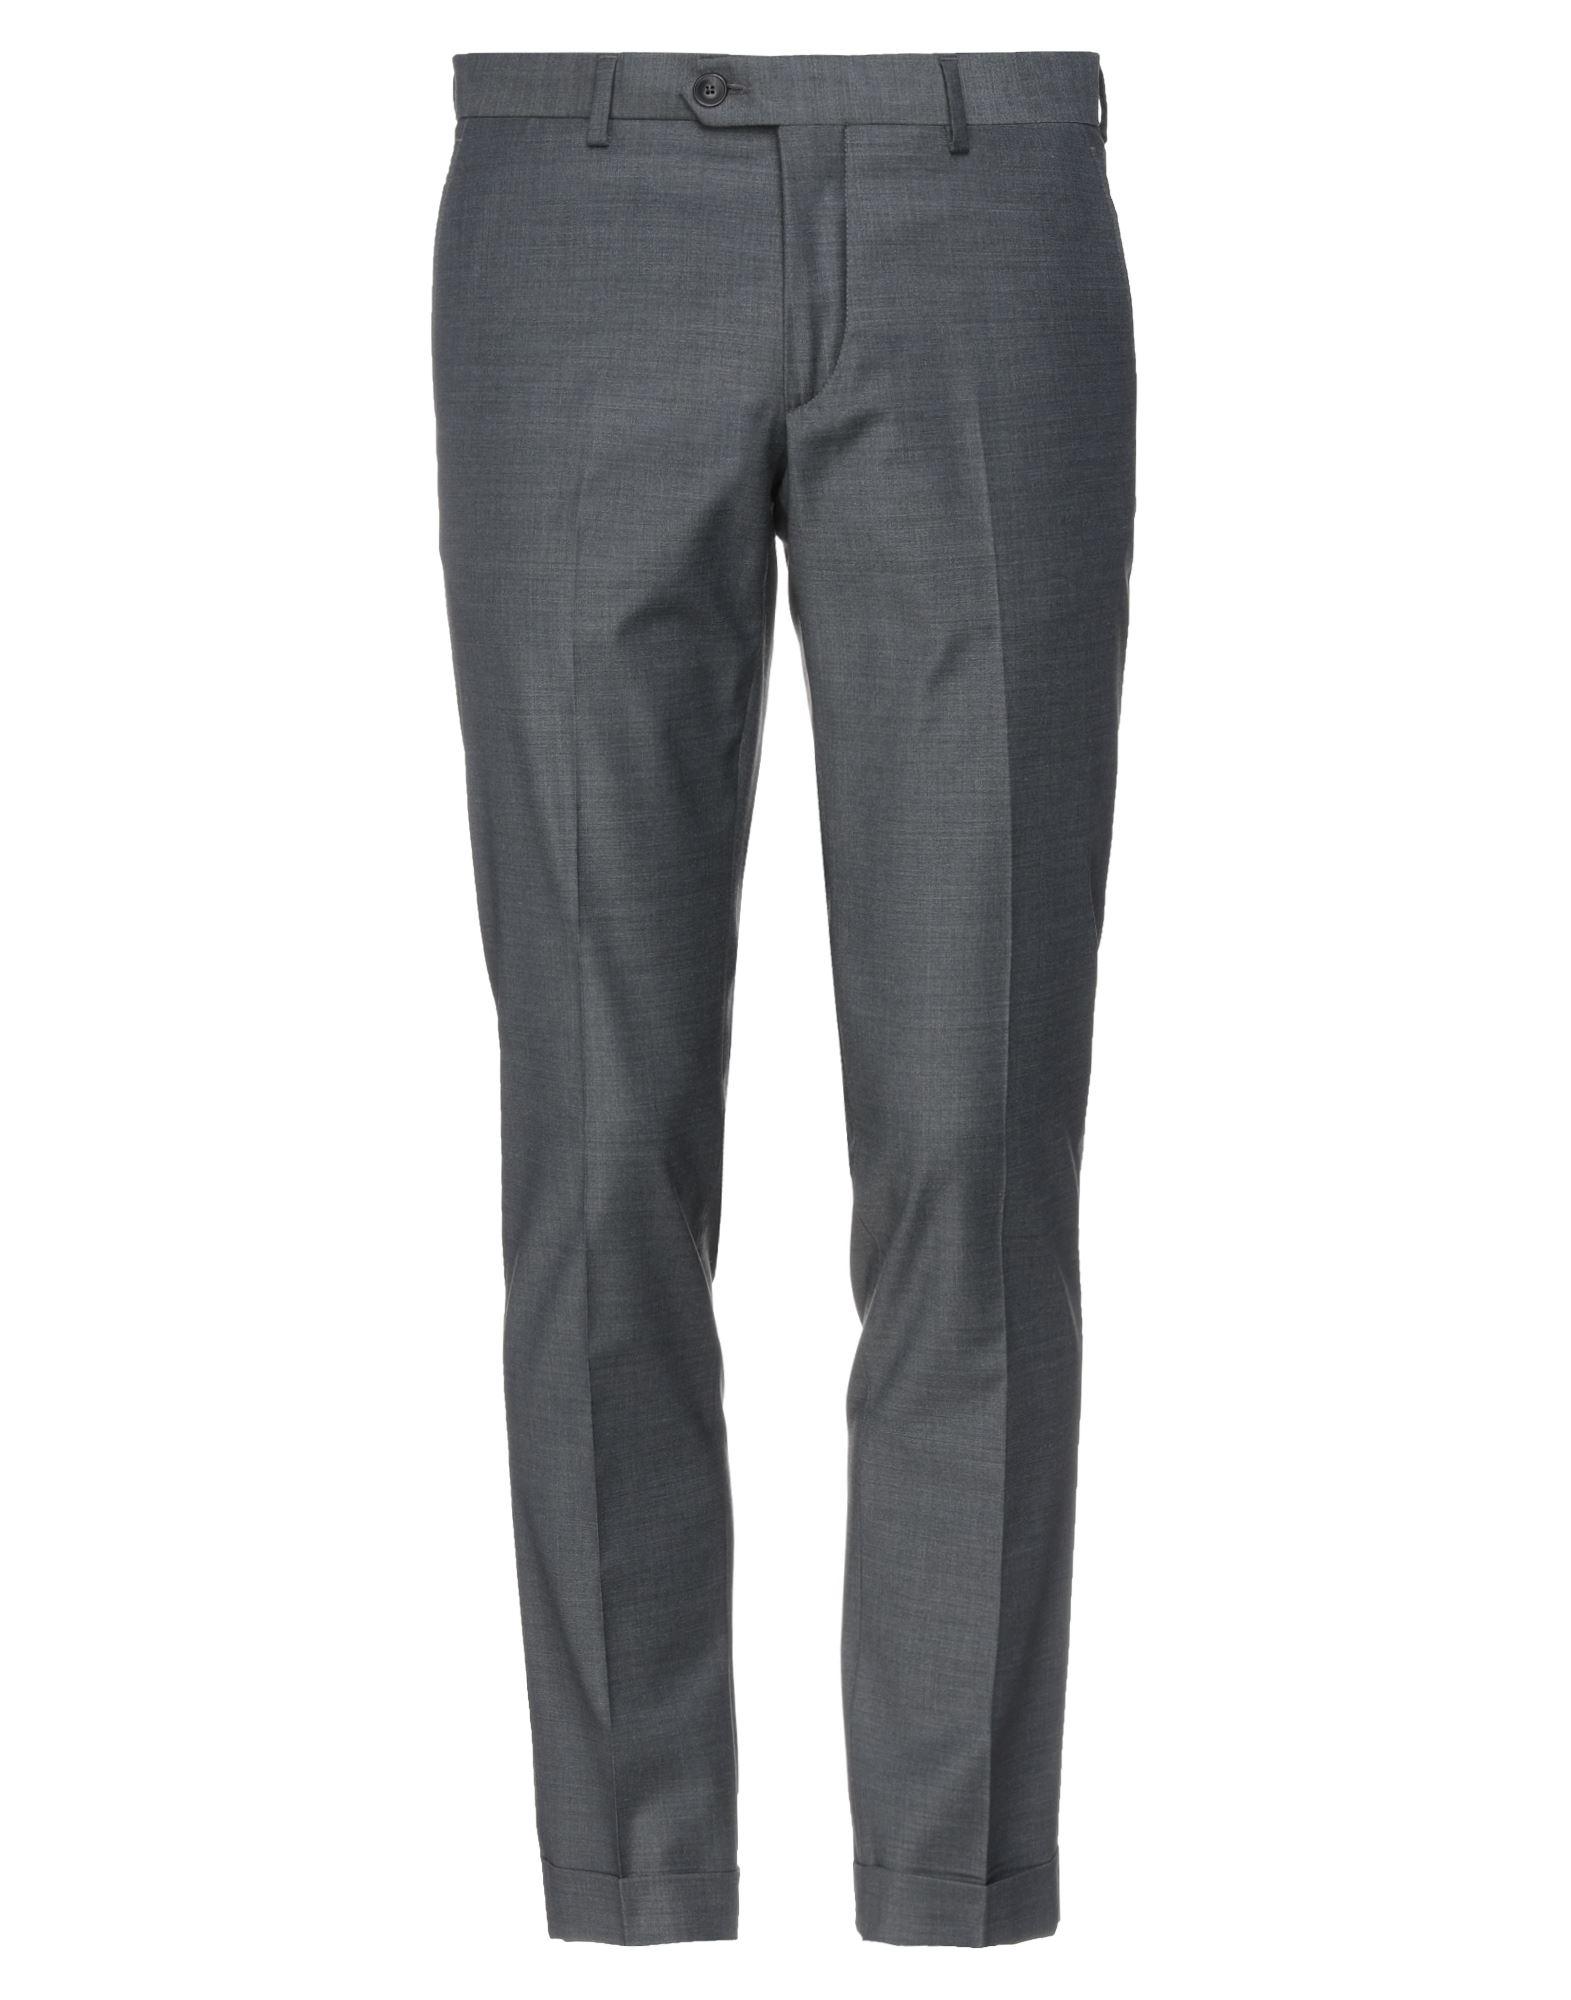 Domenico Tagliente Pants CASUAL PANTS